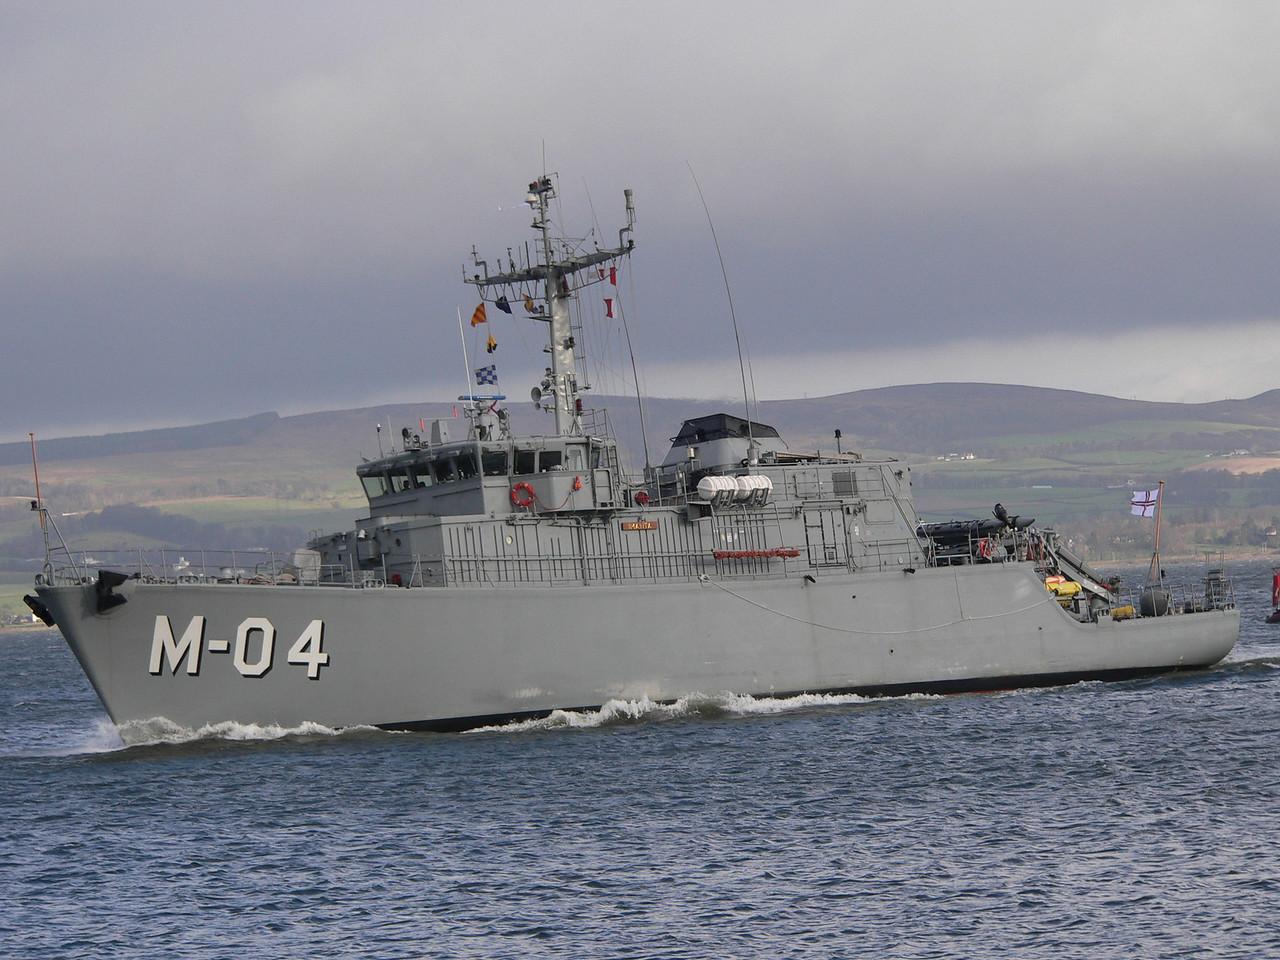 M-04 LVNS IMANTA